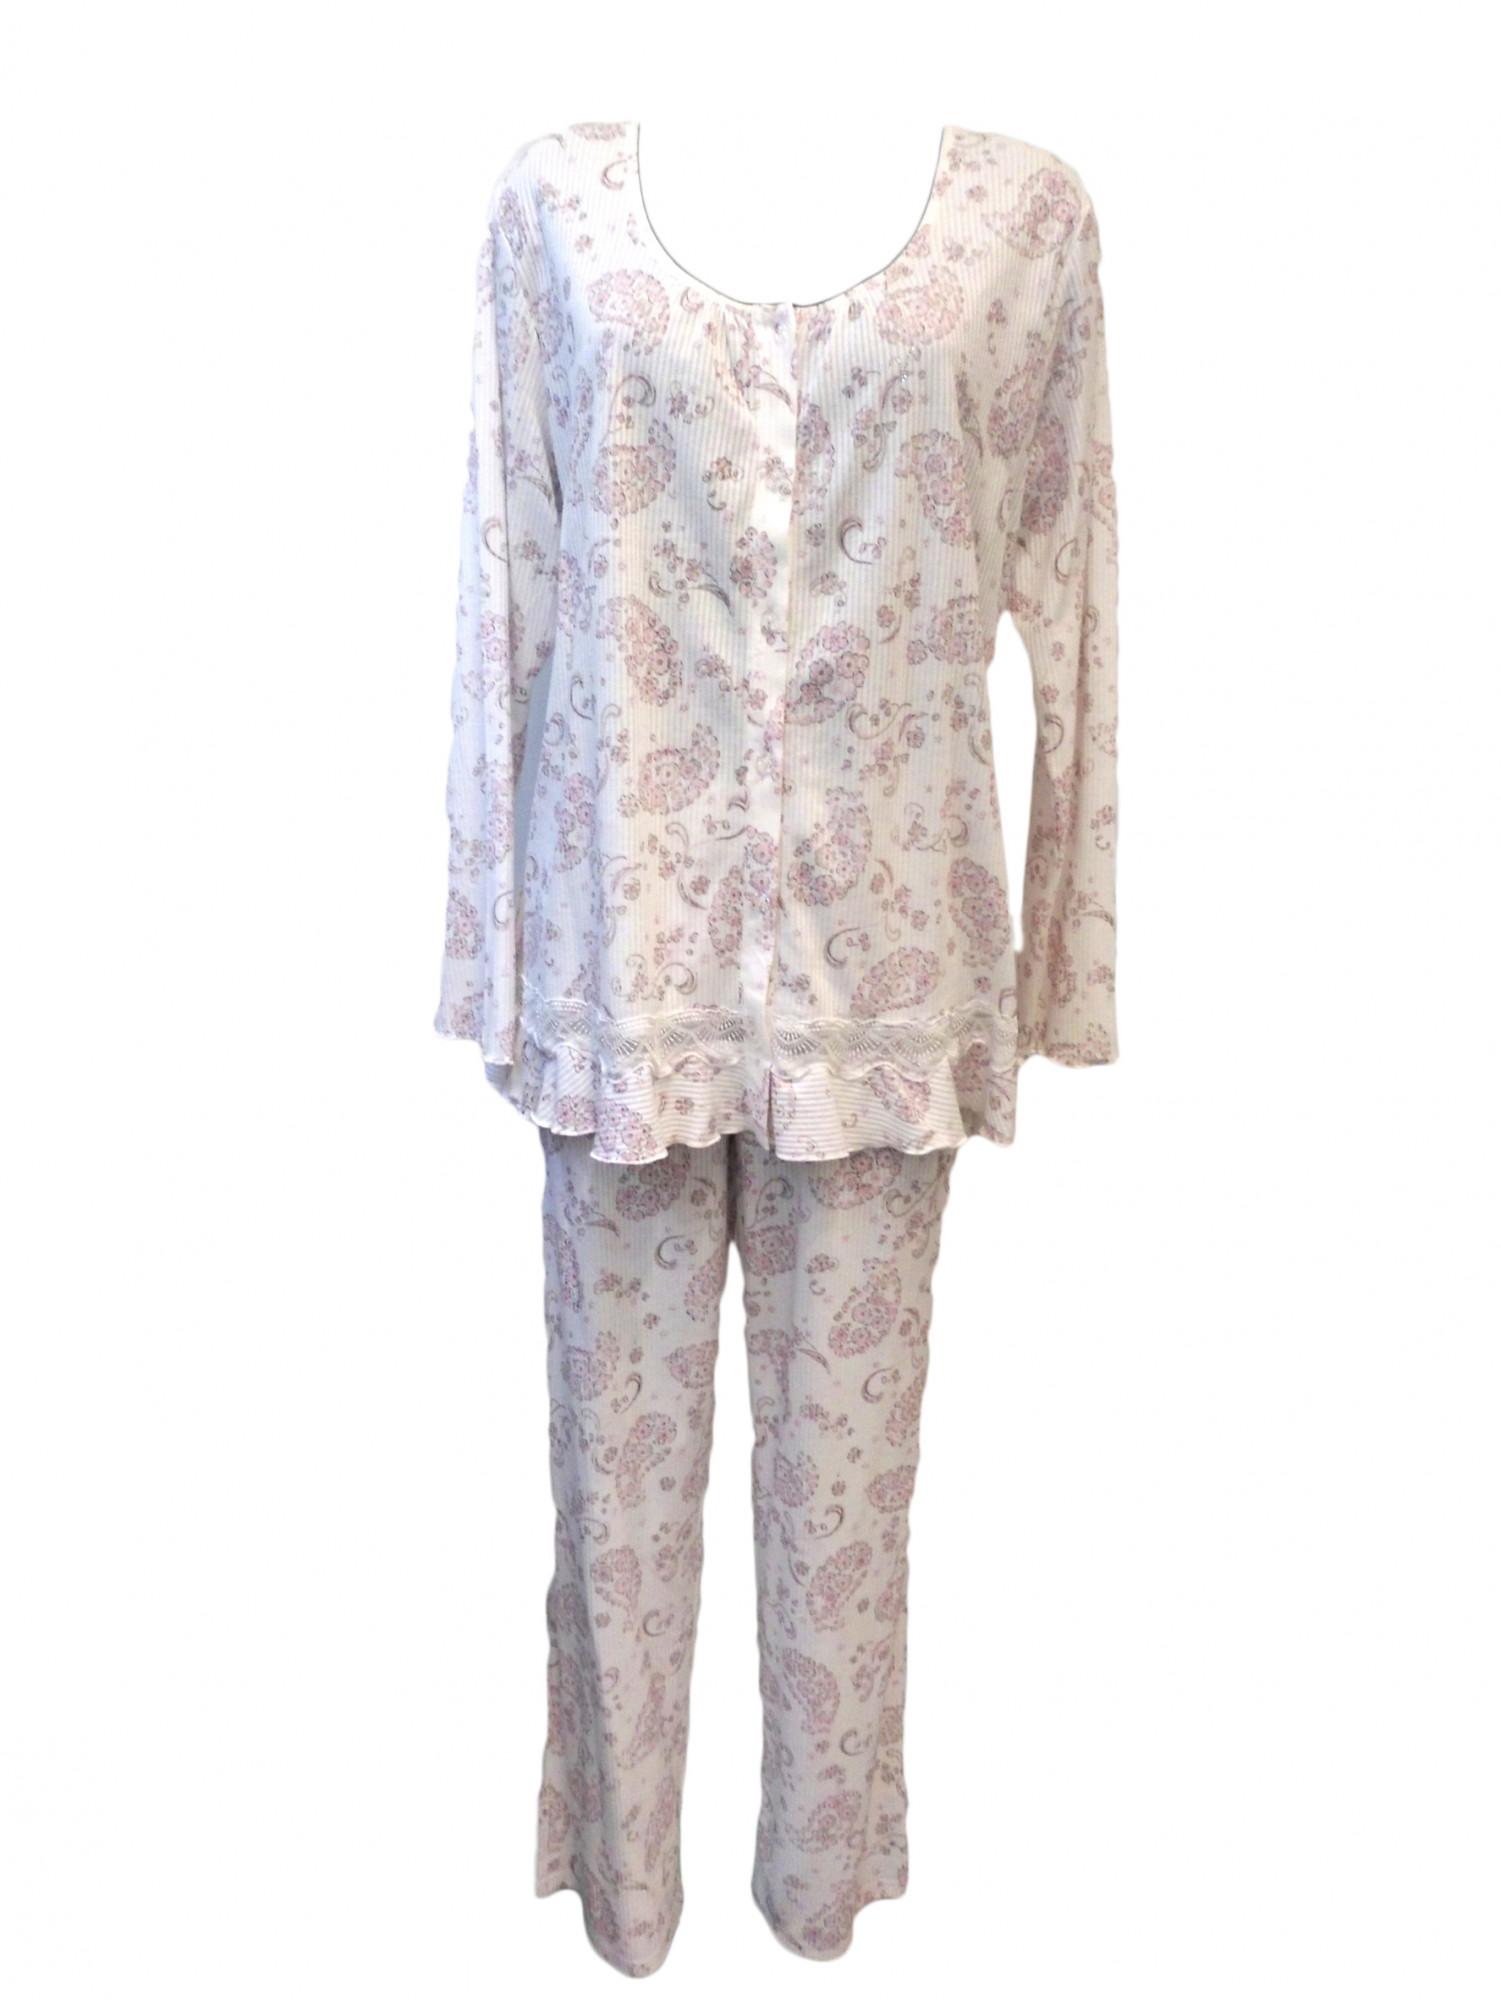 Dámské pyžamo 1470 - Vamp Barva: růžová, Velikost: XXXL